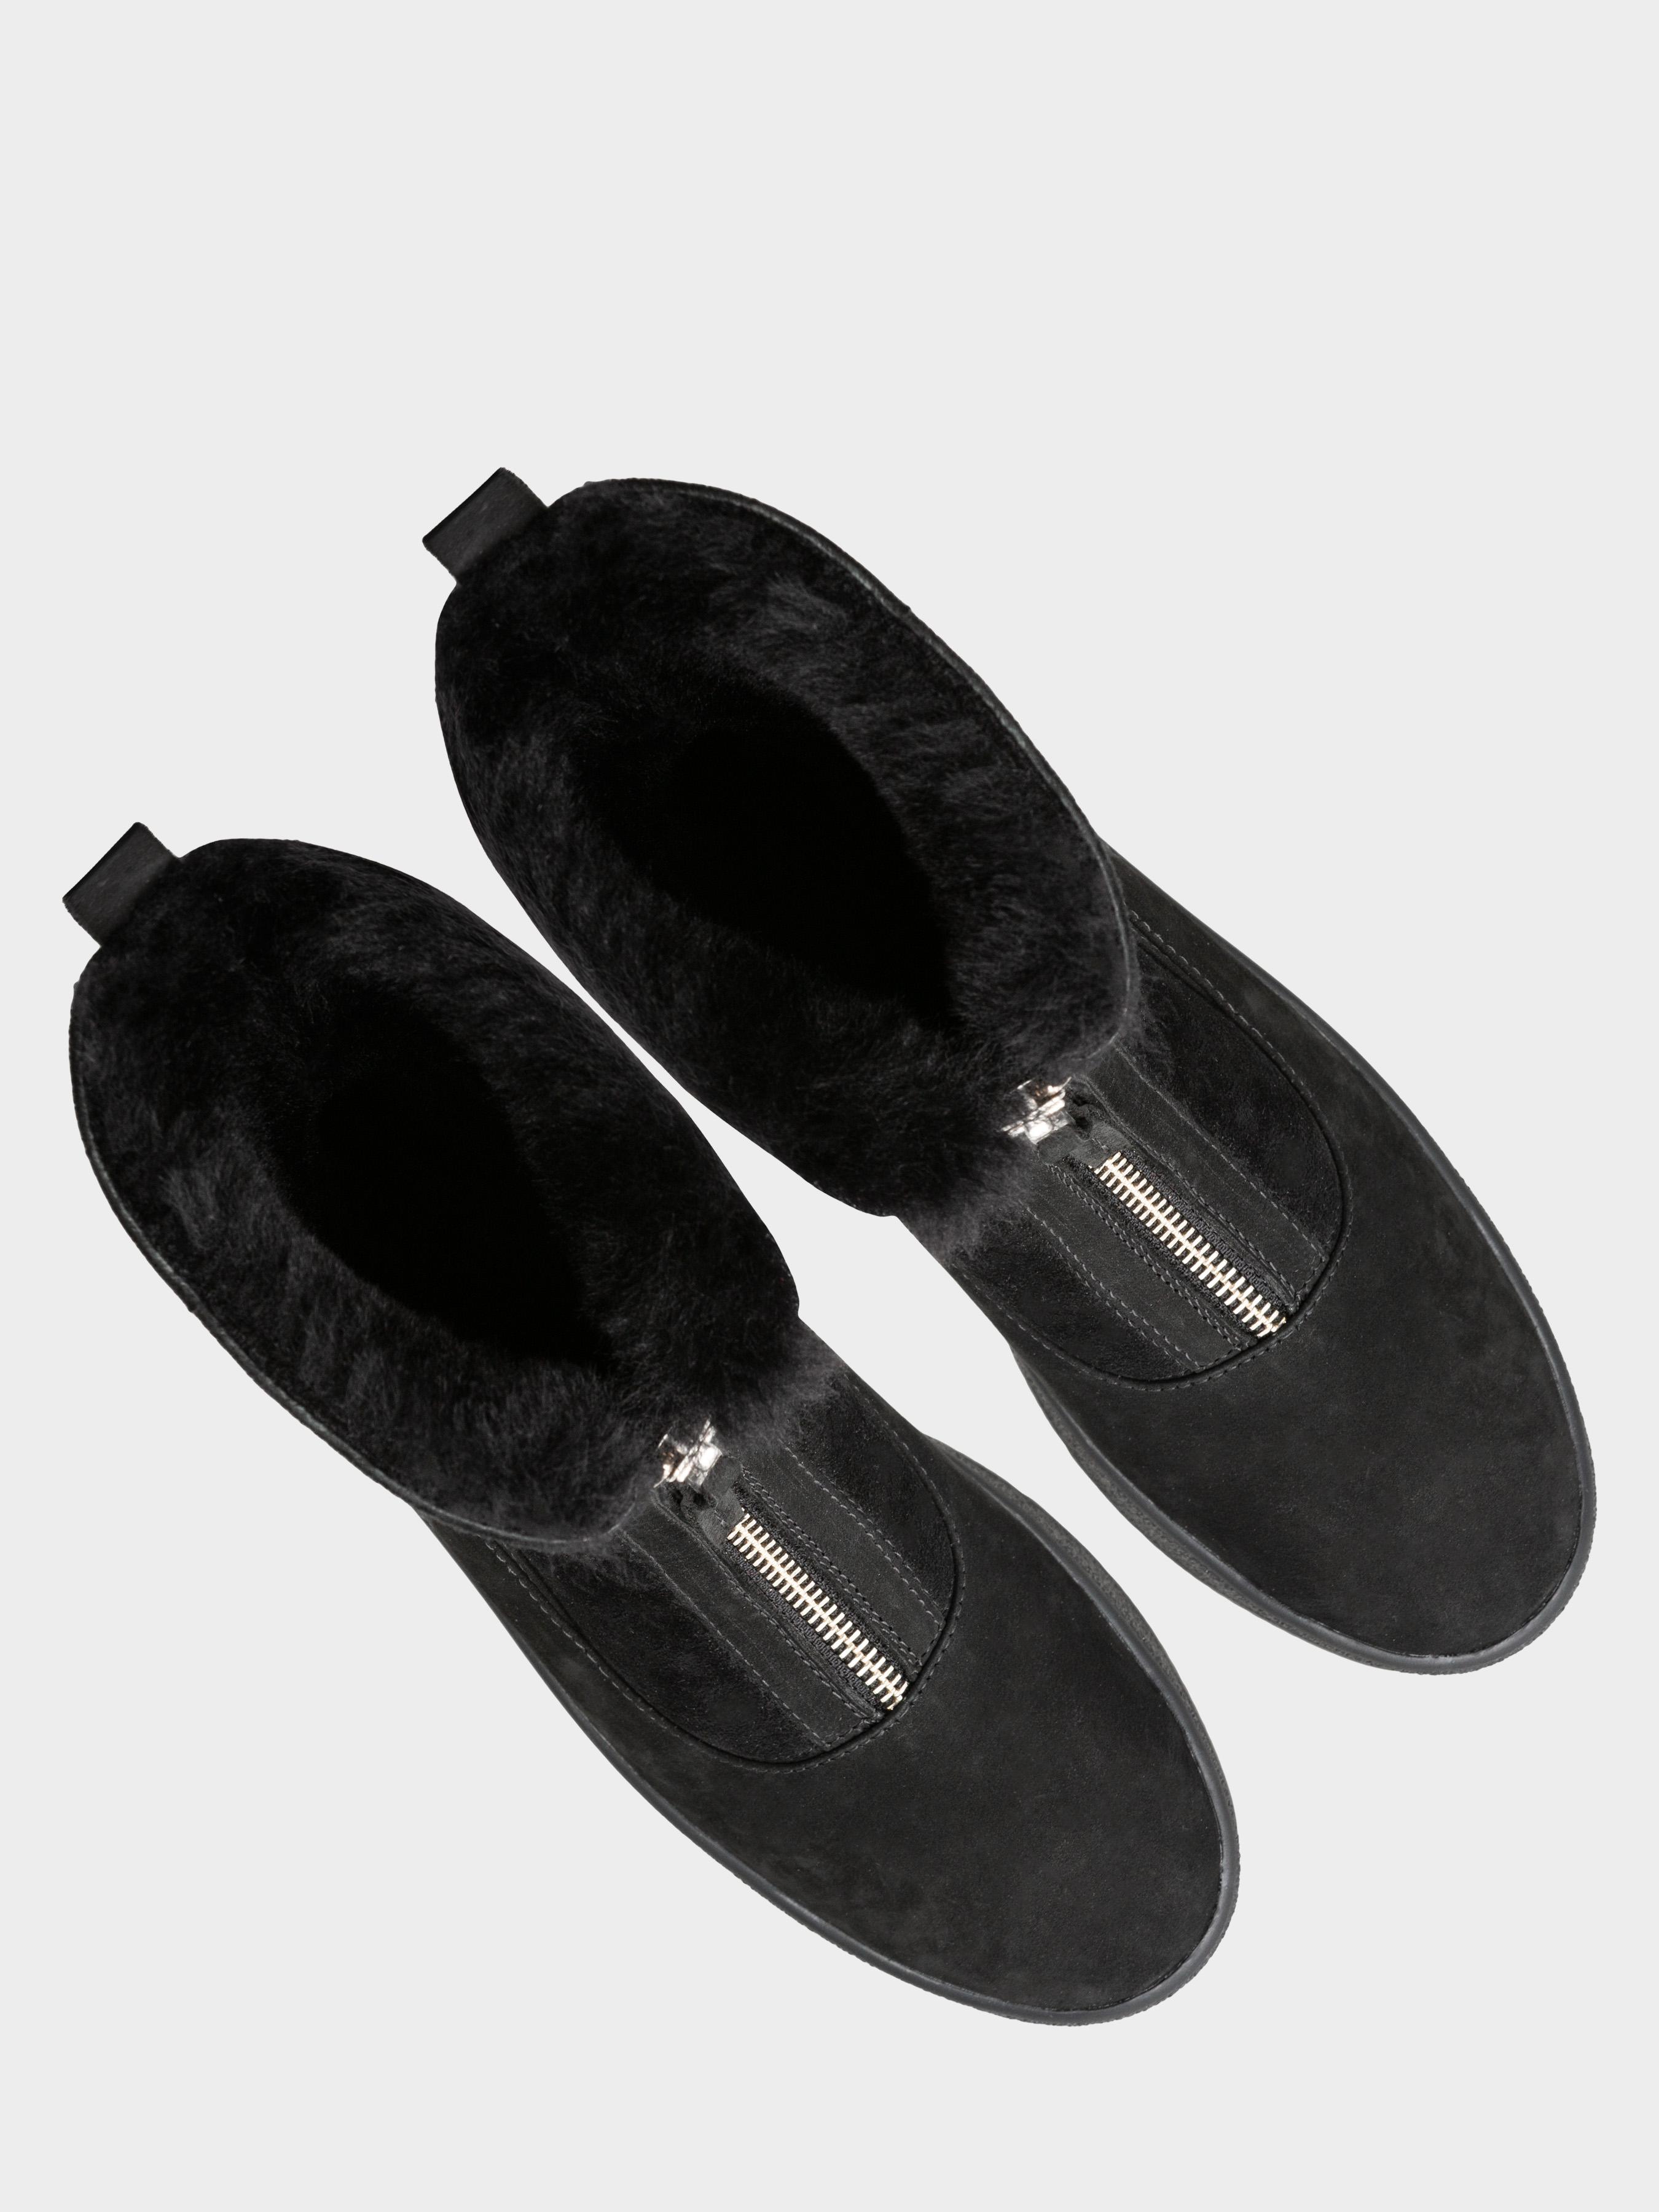 Ботинки для женщин Ботинки женские ENZO VERRATTI 18-1462-8m примерка, 2017